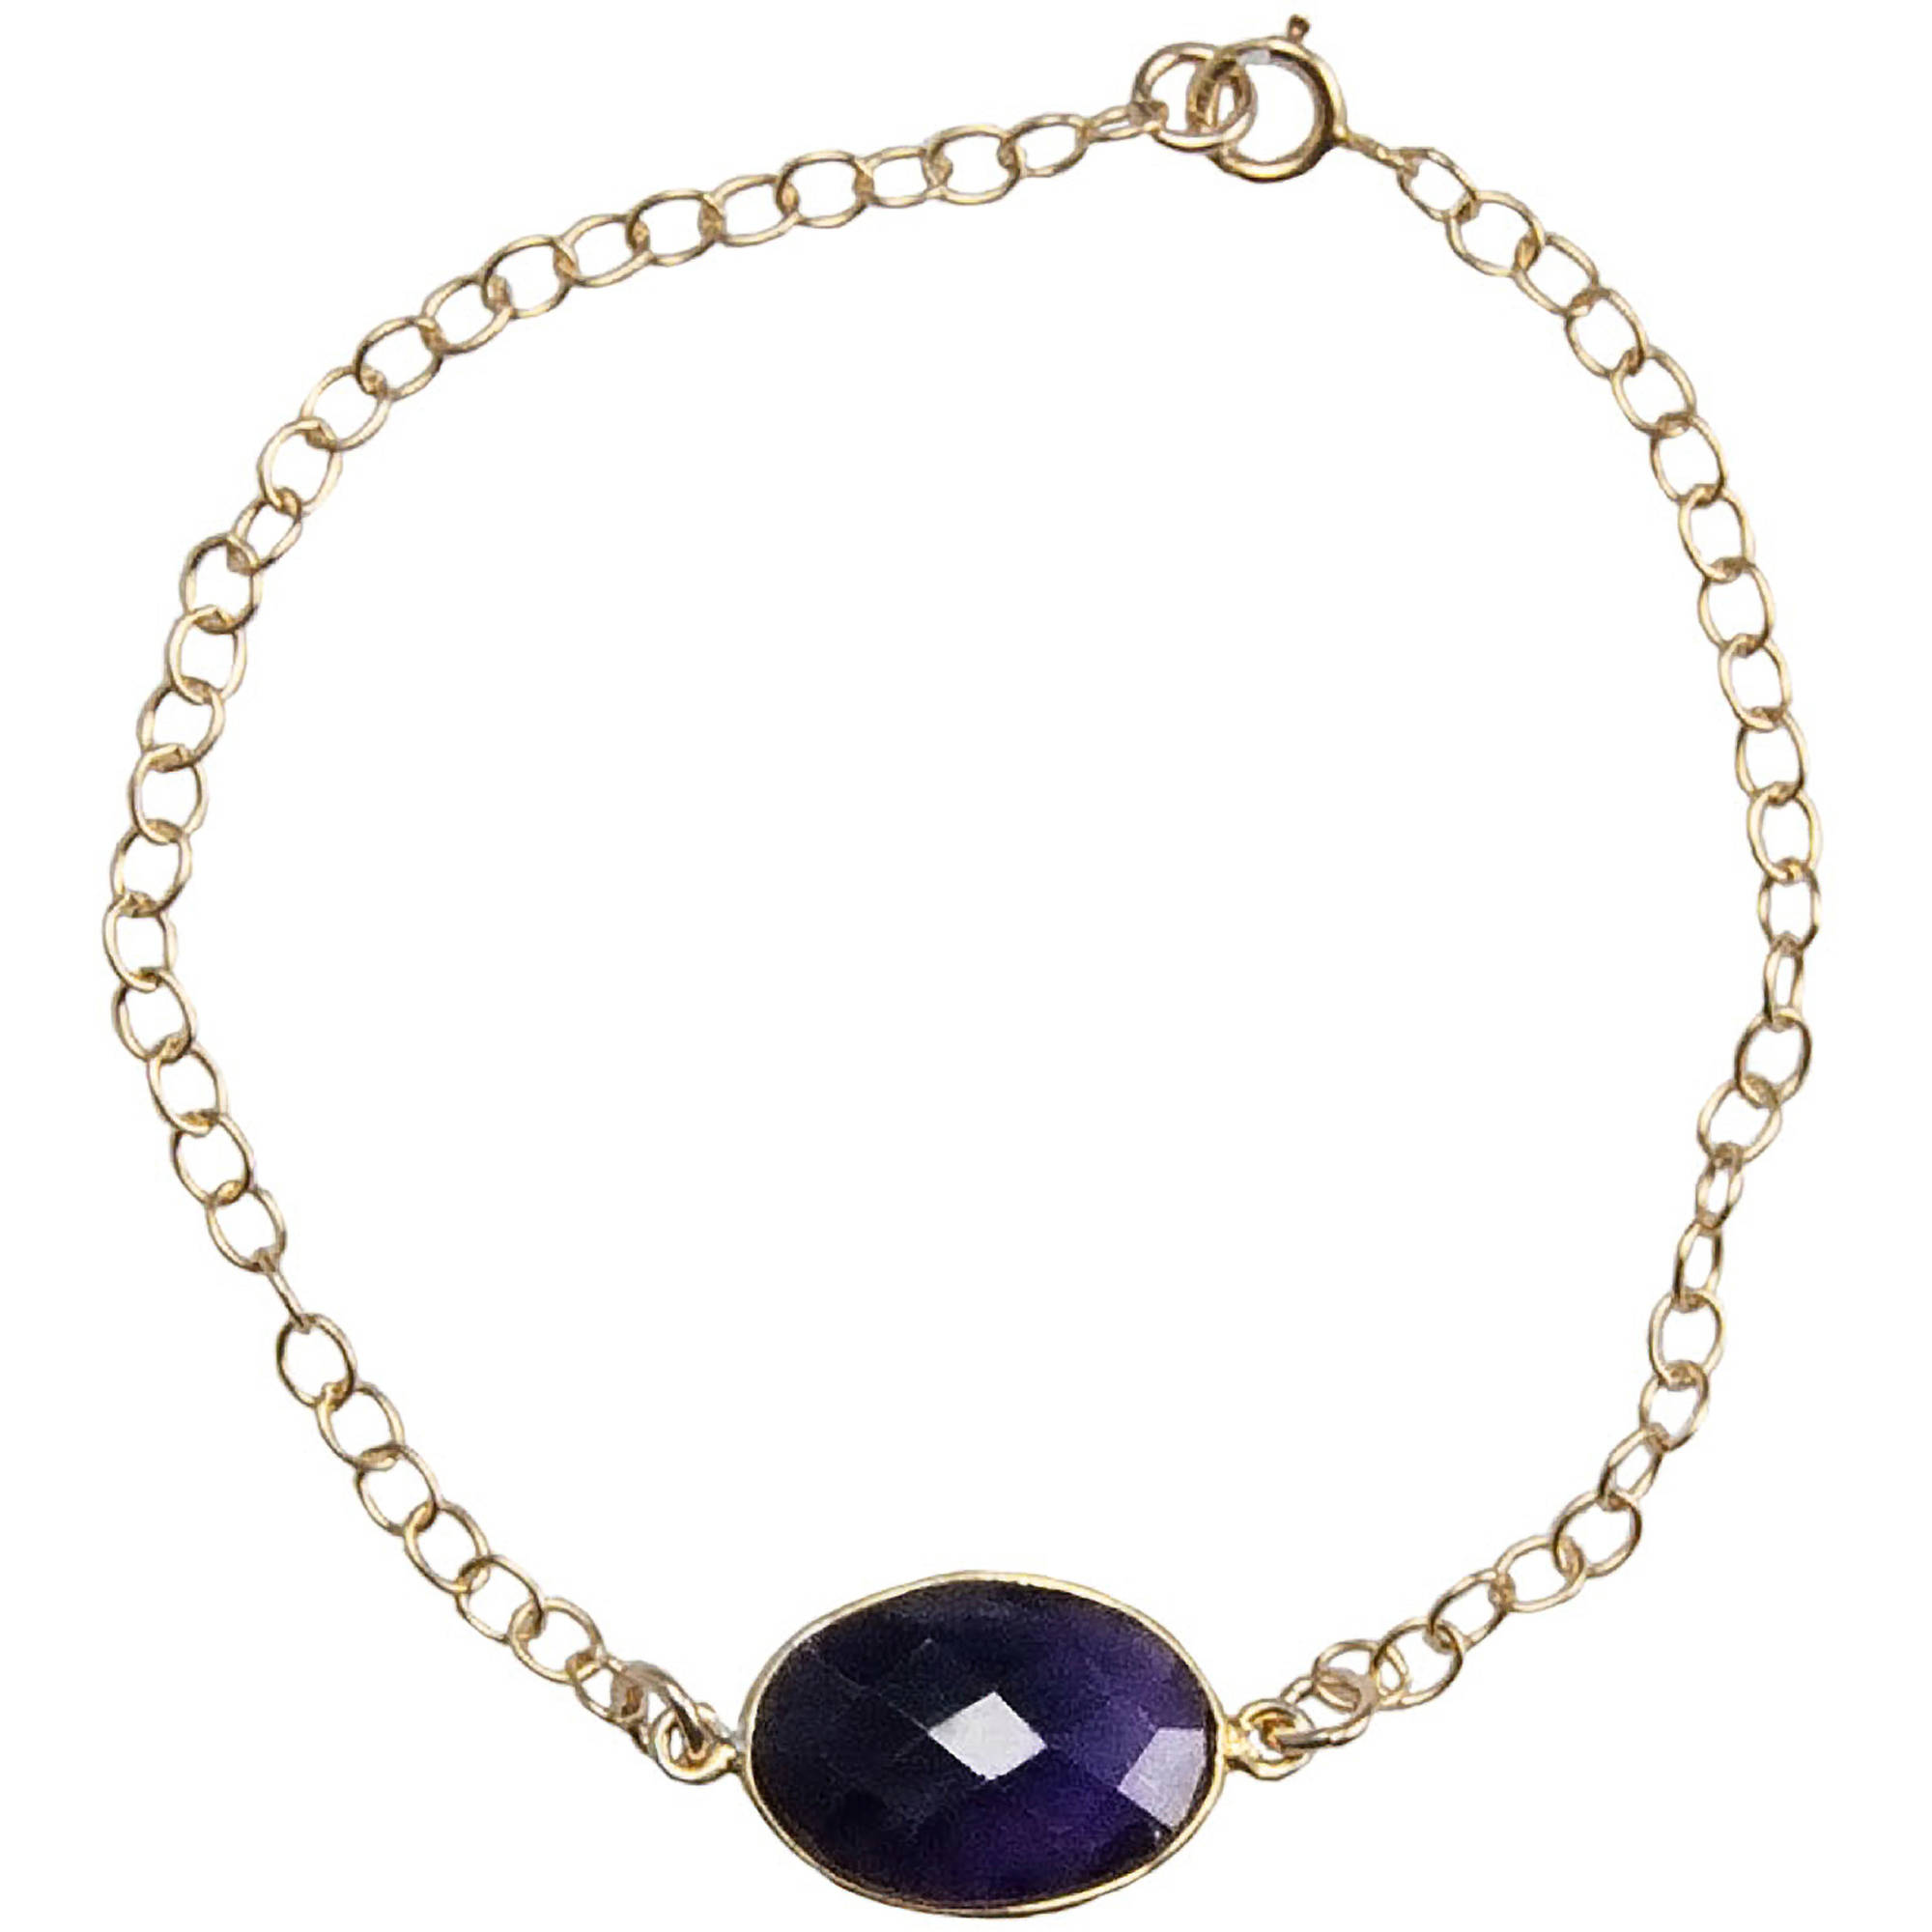 Miss Zoe by Calinana Gold Filled Gemstone Bracelet, Purple